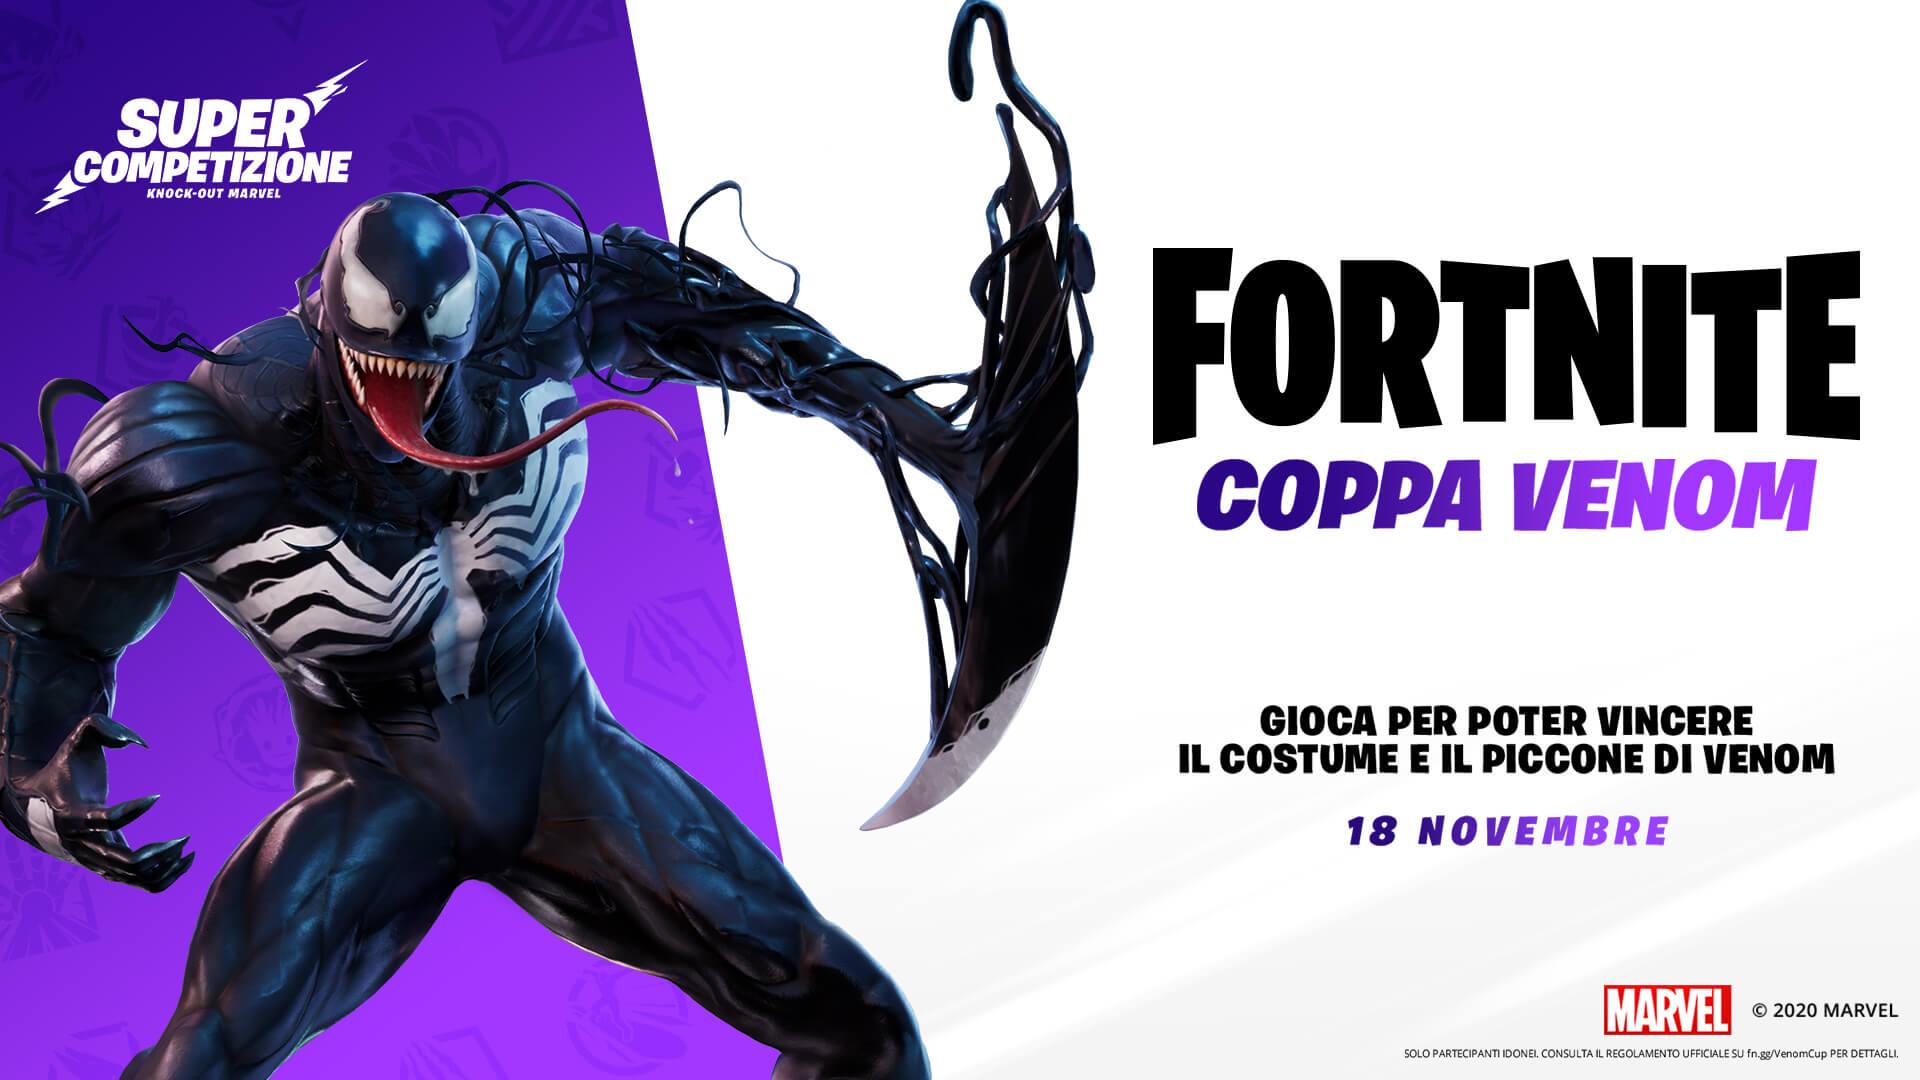 Fortnite Venom Outfit It